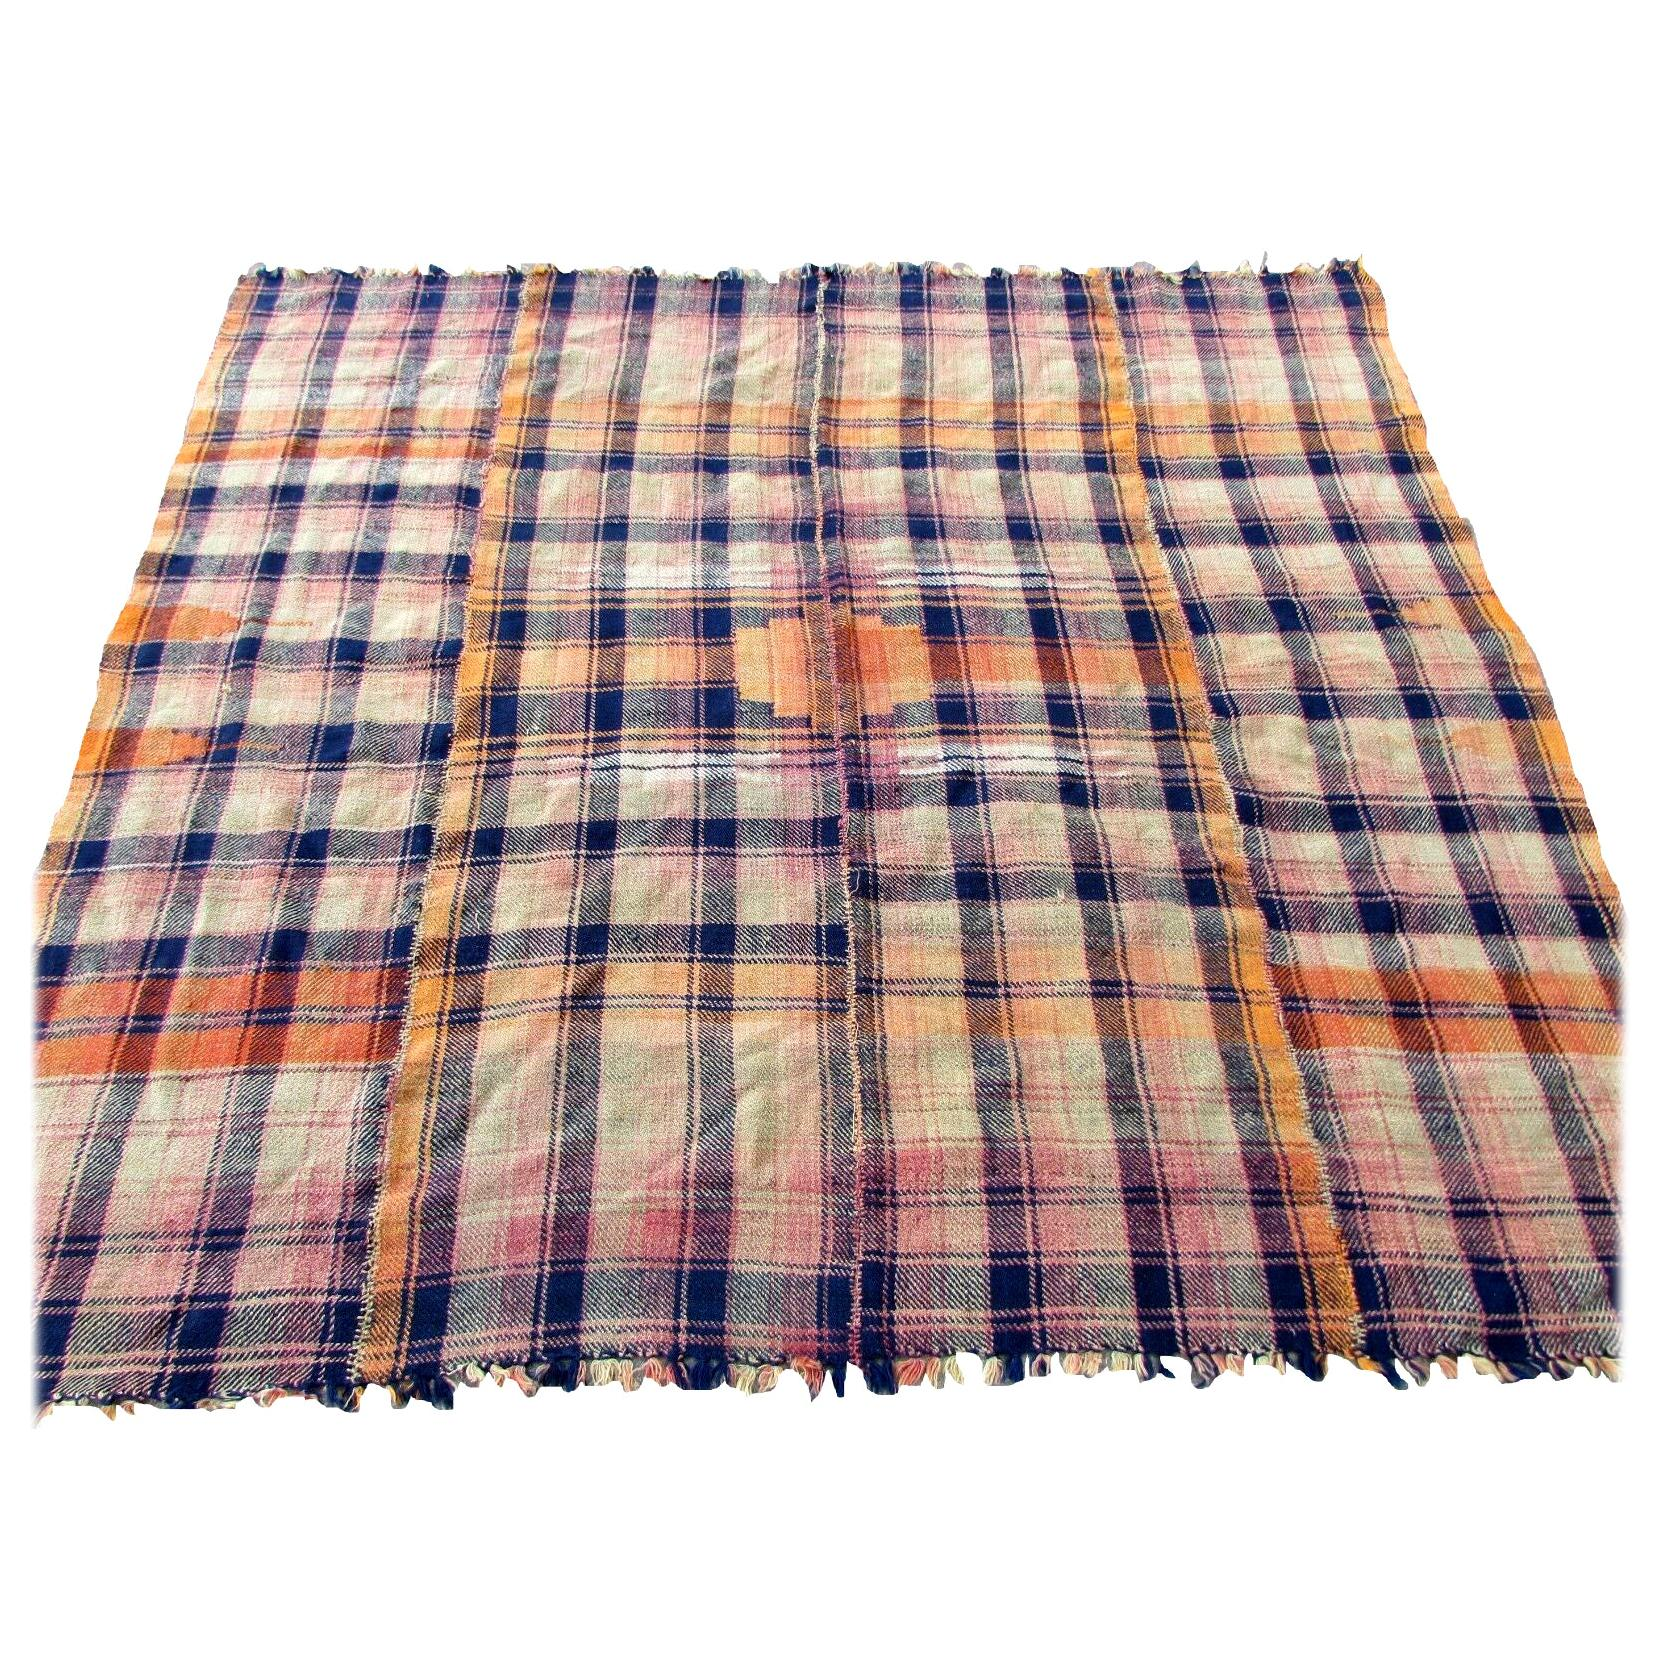 Handmade Vintage Mojj Style Kilim, 1960s, 1Q0308